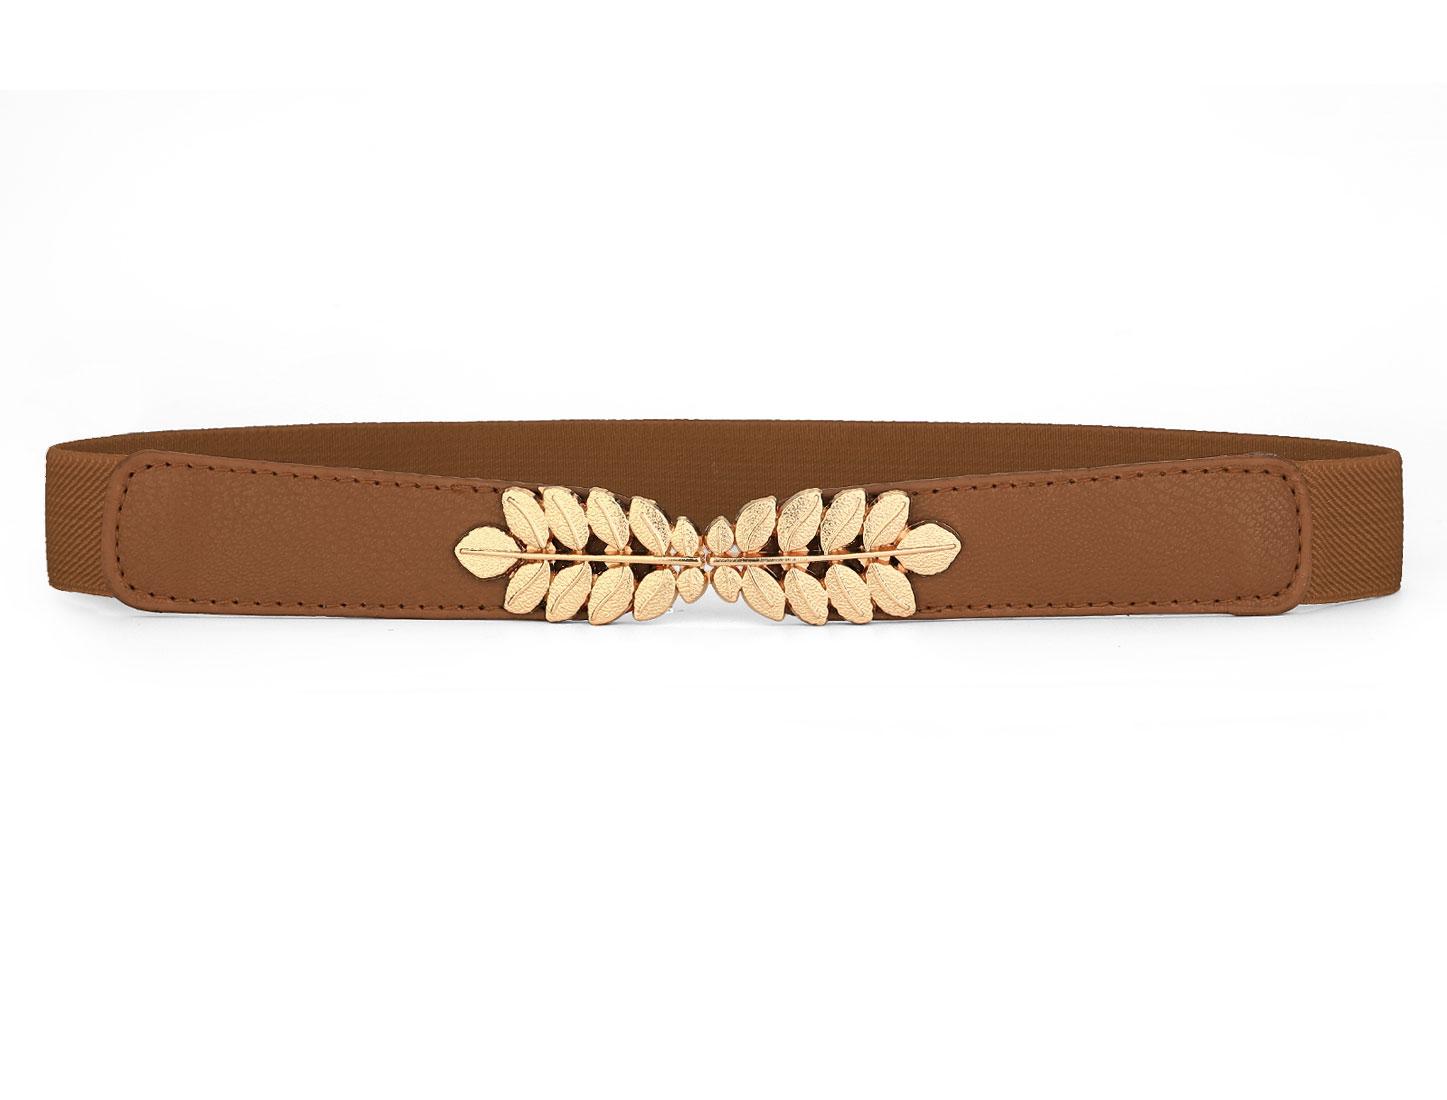 Lady Brown Textured Elastic Faux Leather Interlocking Buckle Cinch Belt